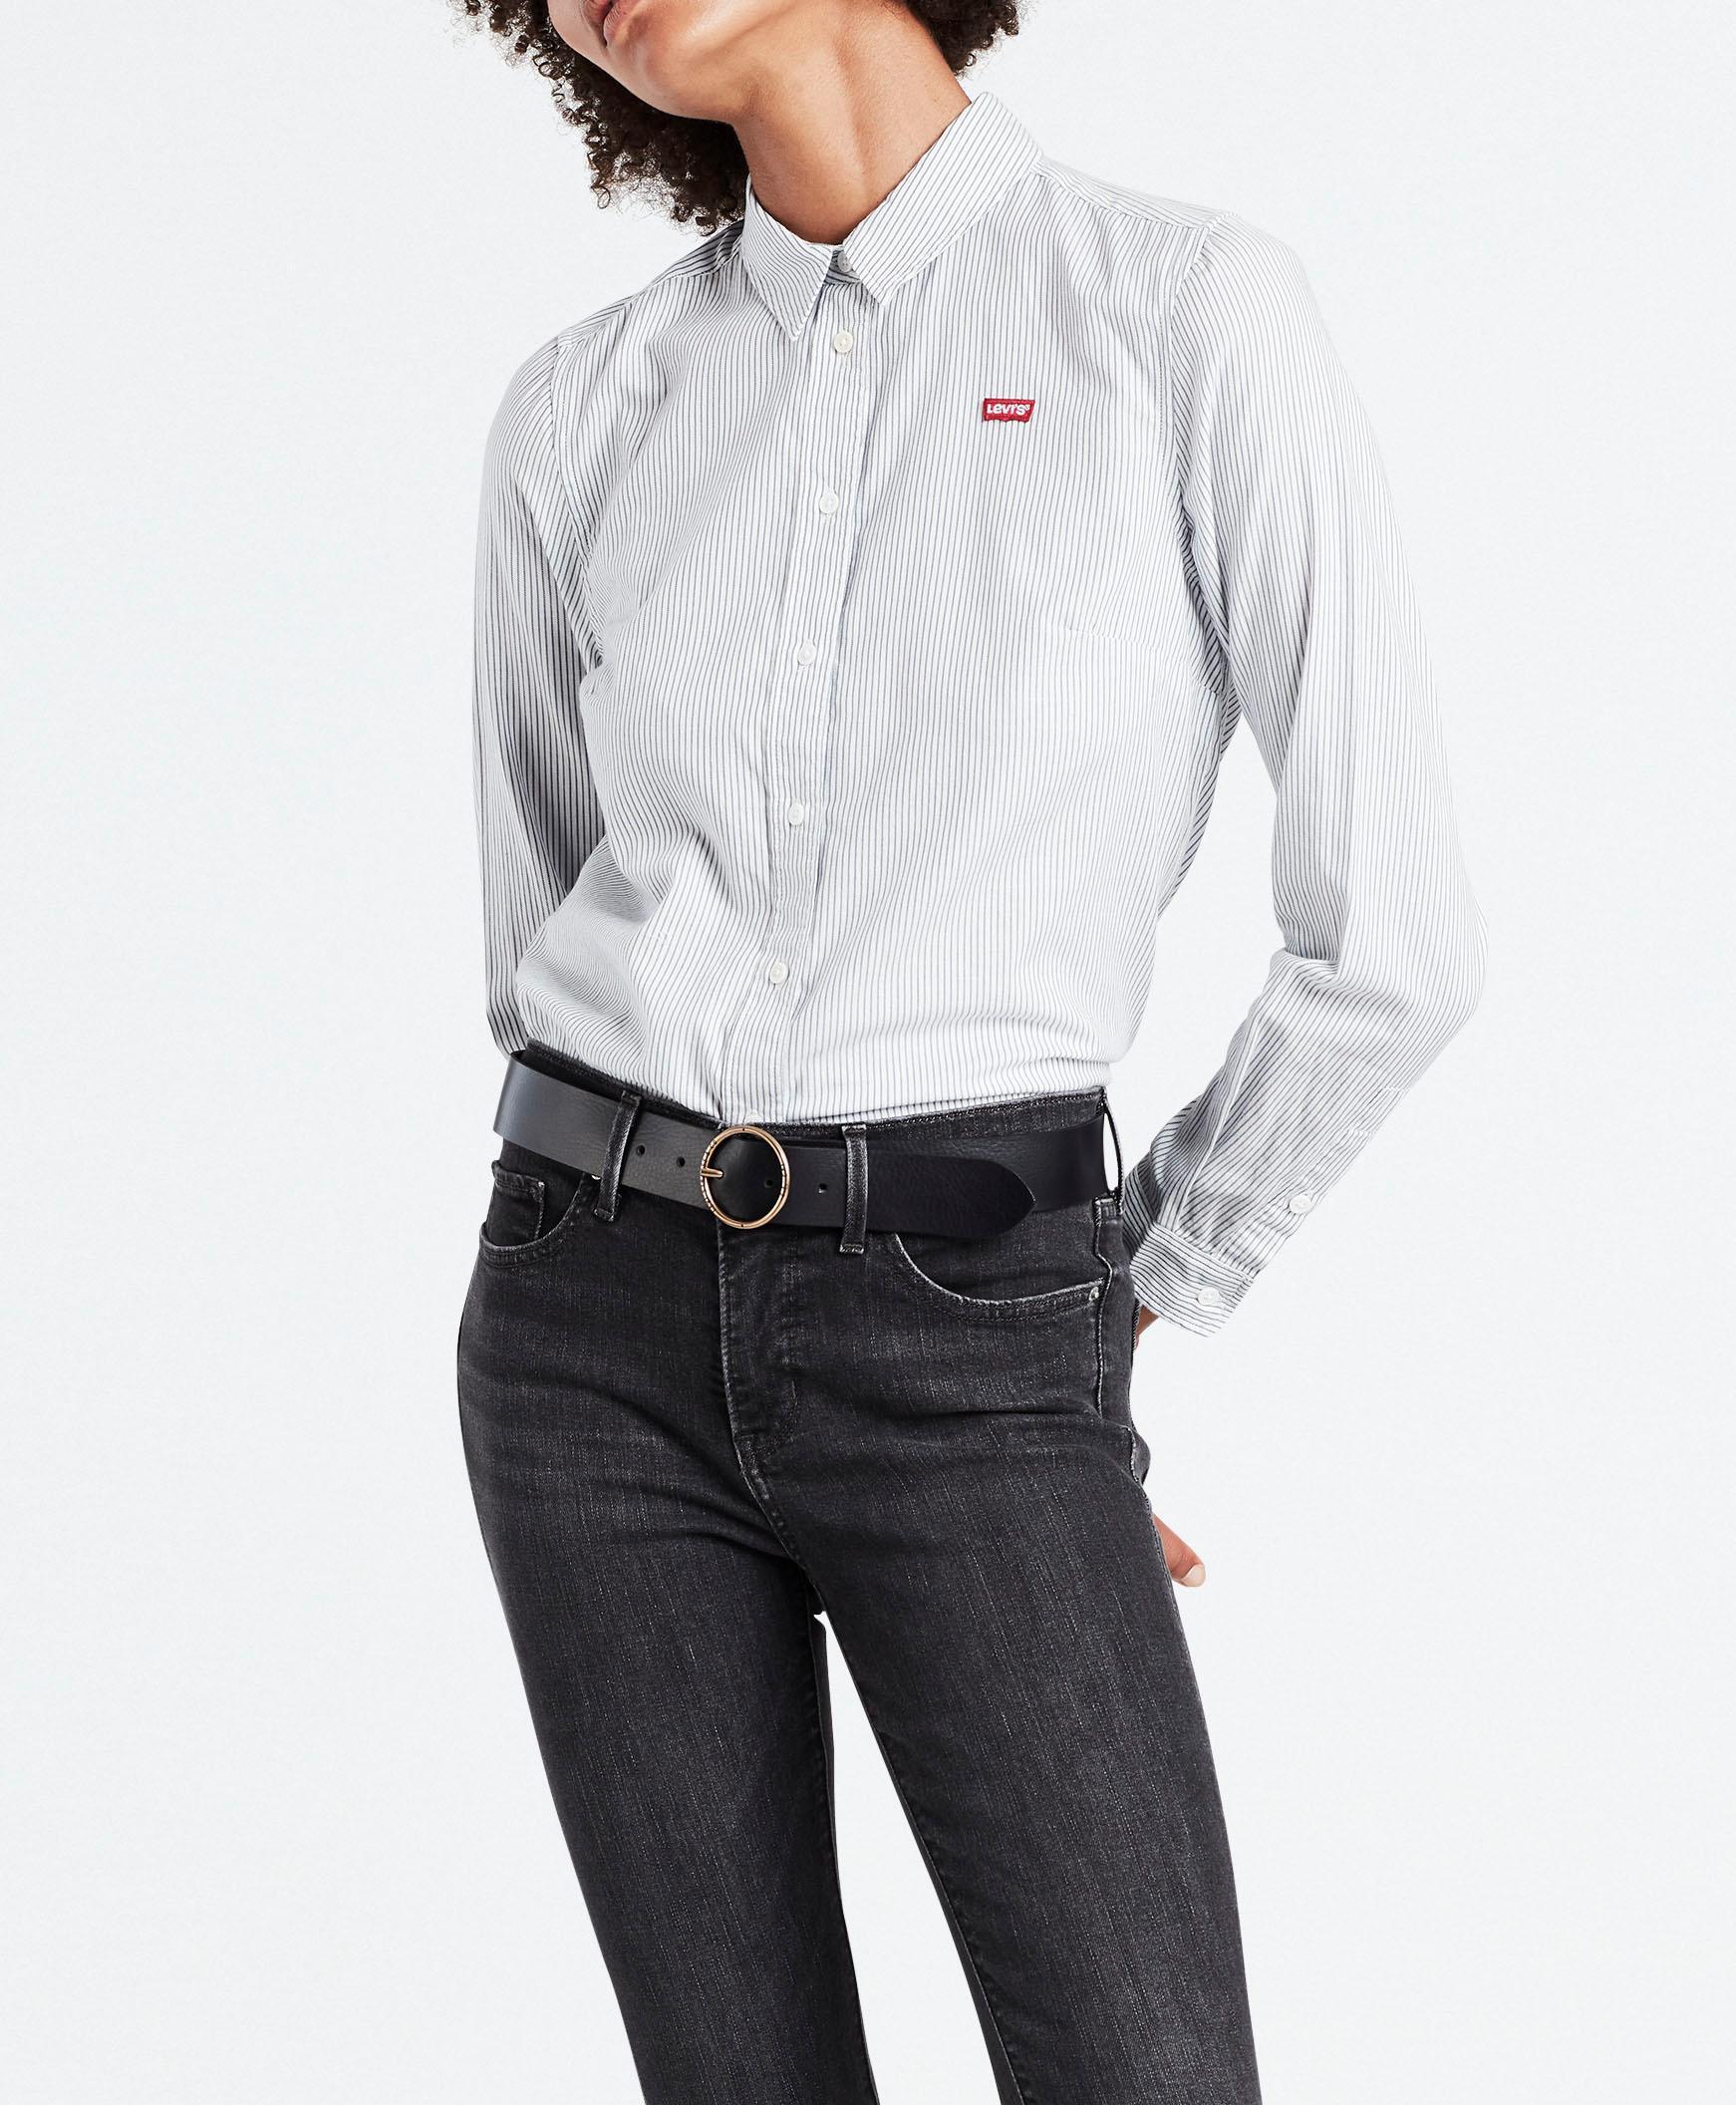 Levi's Klassische Bluse Ultimate Shirt